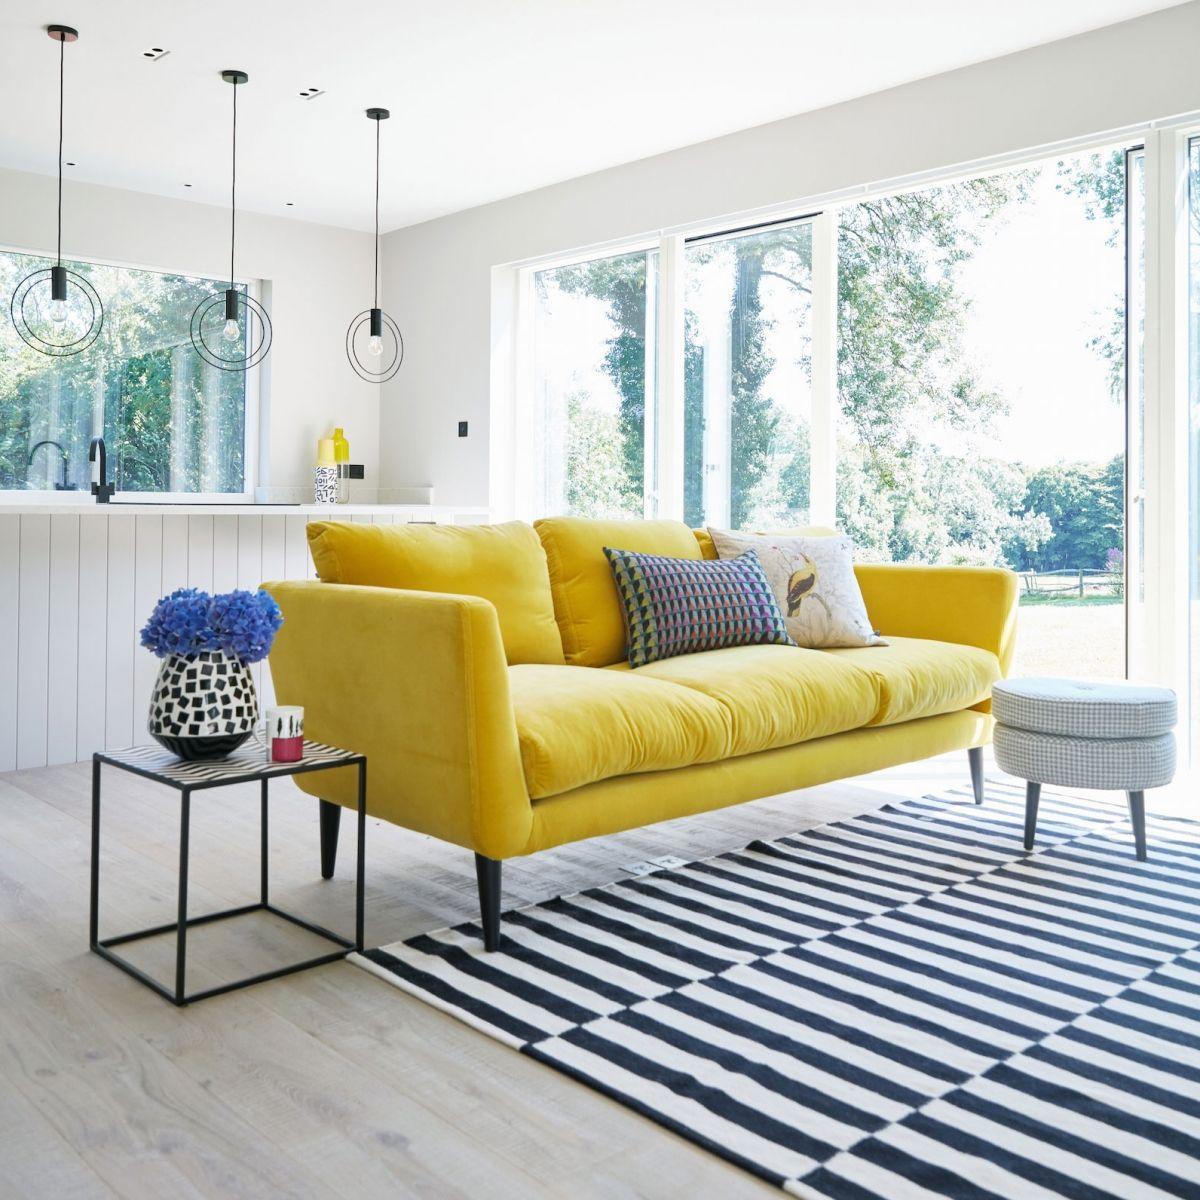 That Yellow Velvet Sofa Living Room Sofa Living Room Decor Colors Yellow Sofa